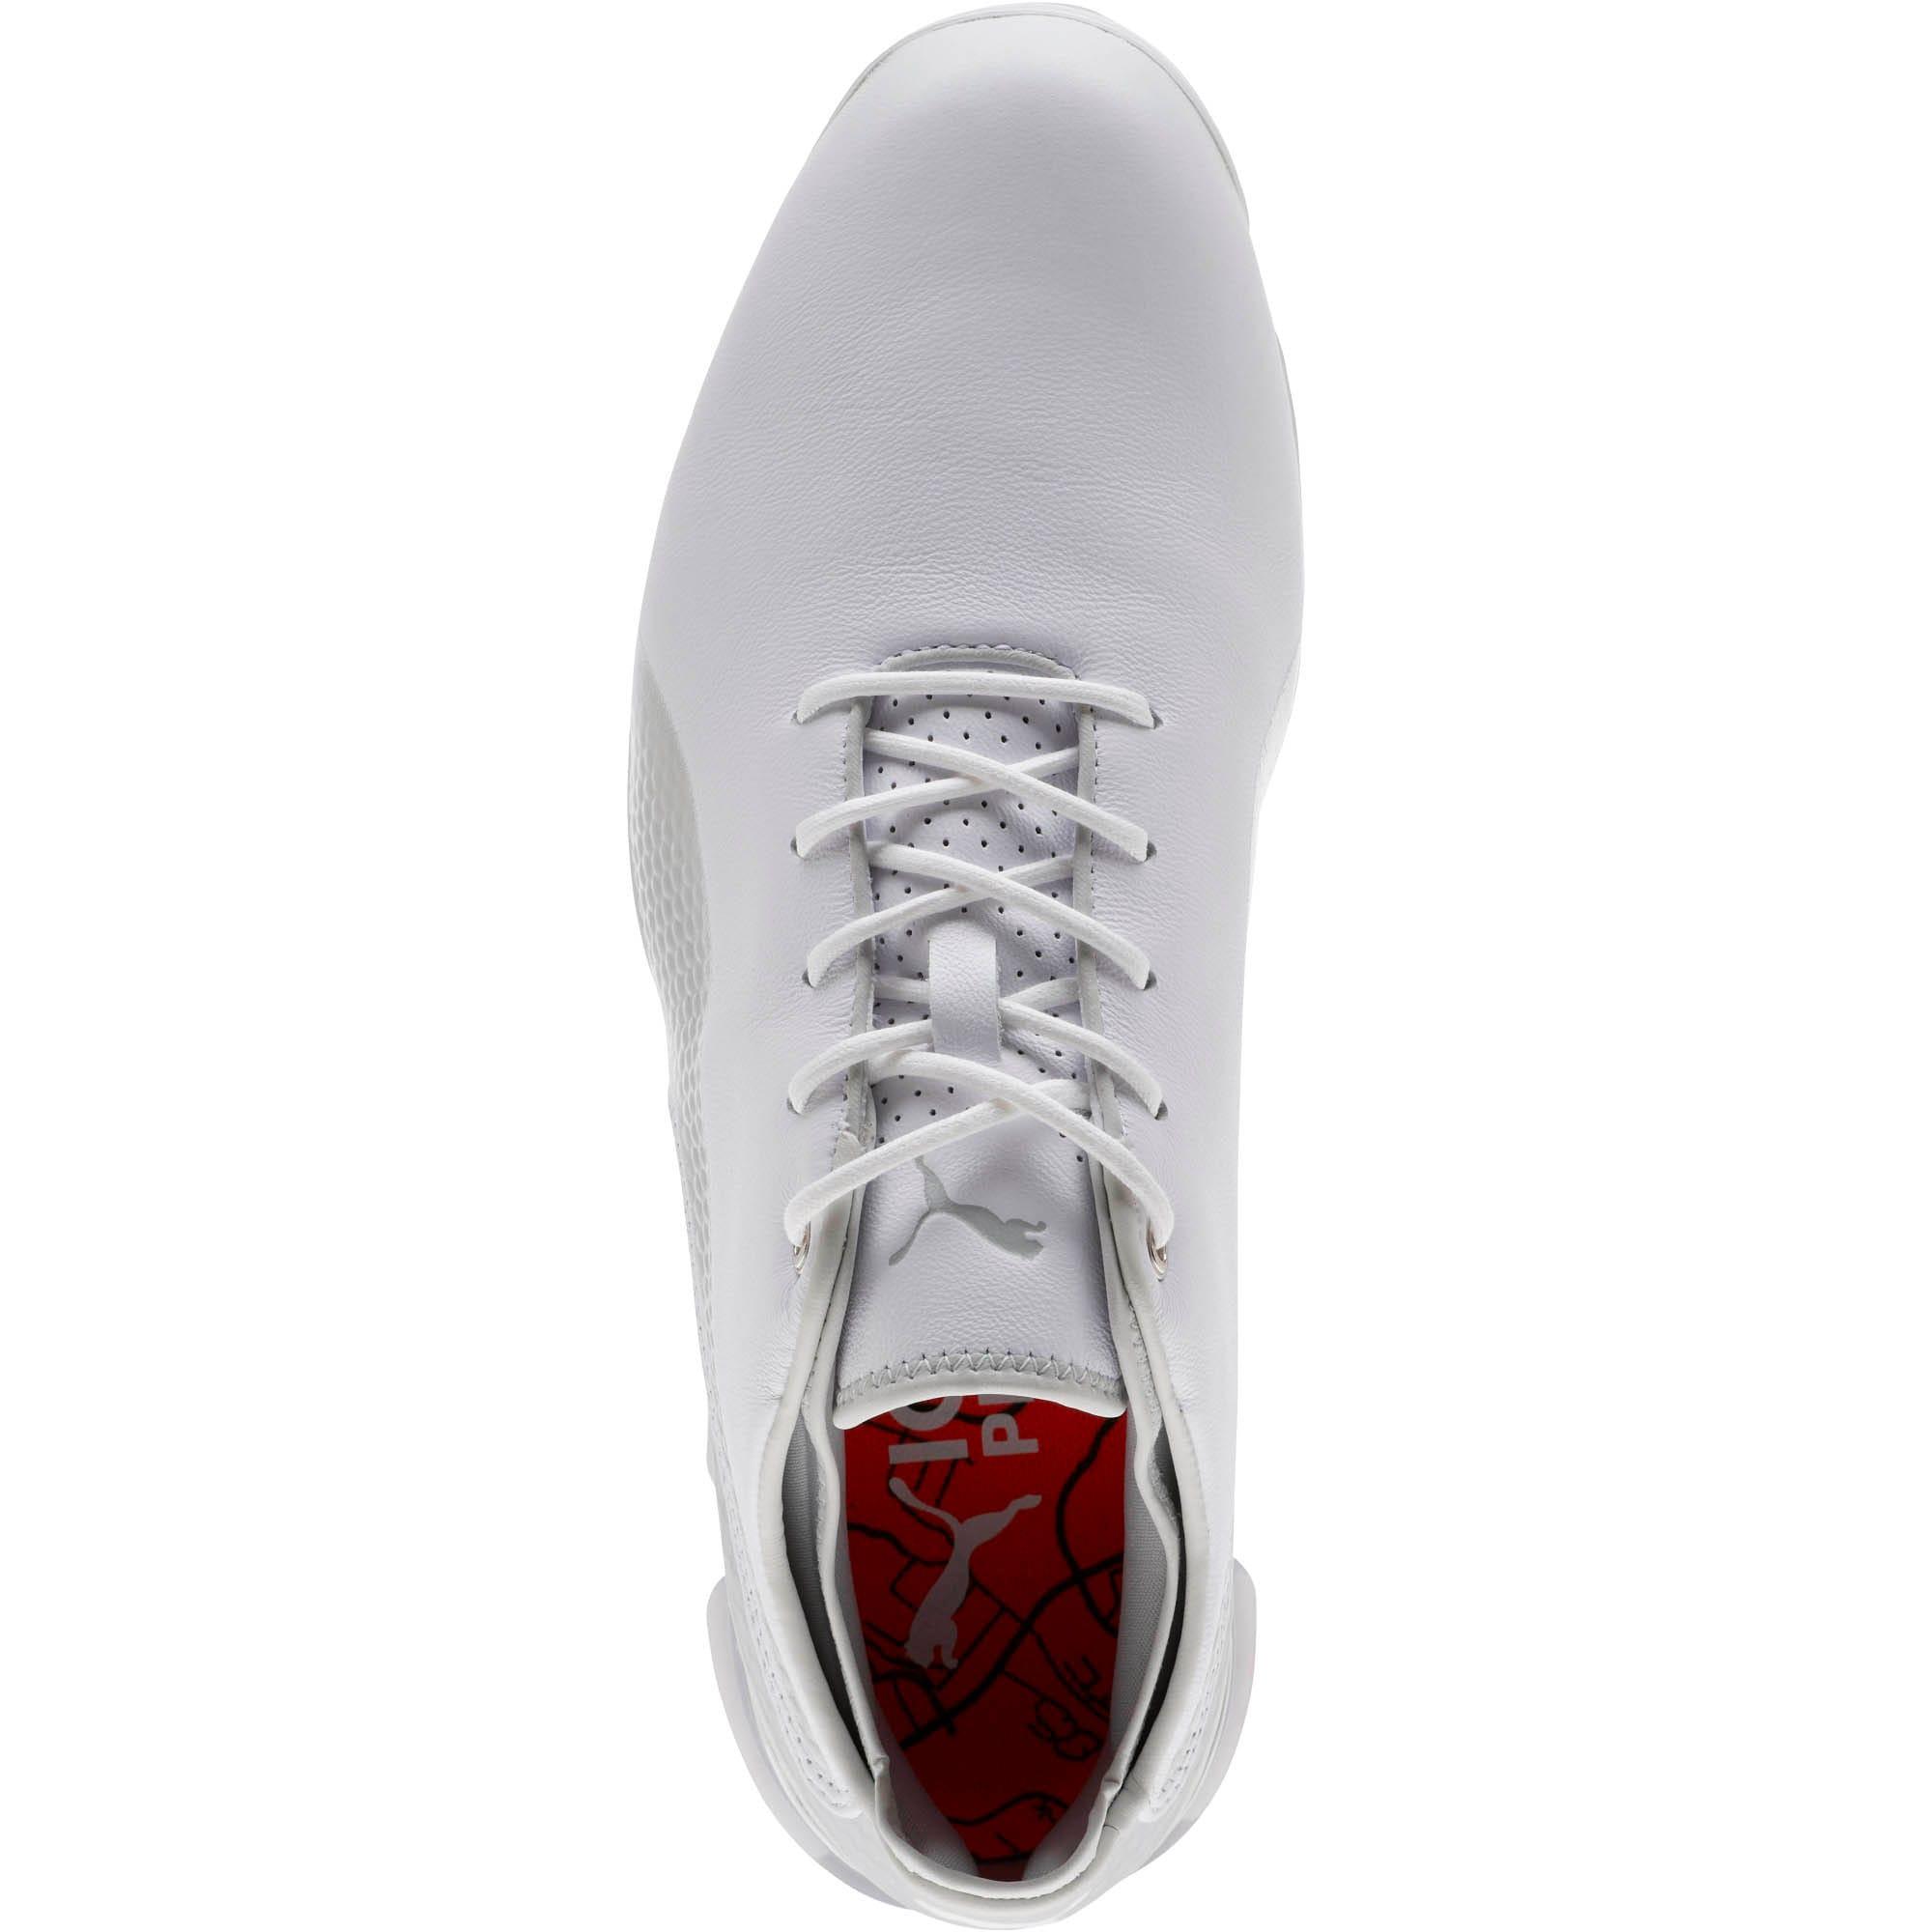 Thumbnail 5 of IGNITE PROADAPT Men's Golf Shoes, White-Gray Violet, medium